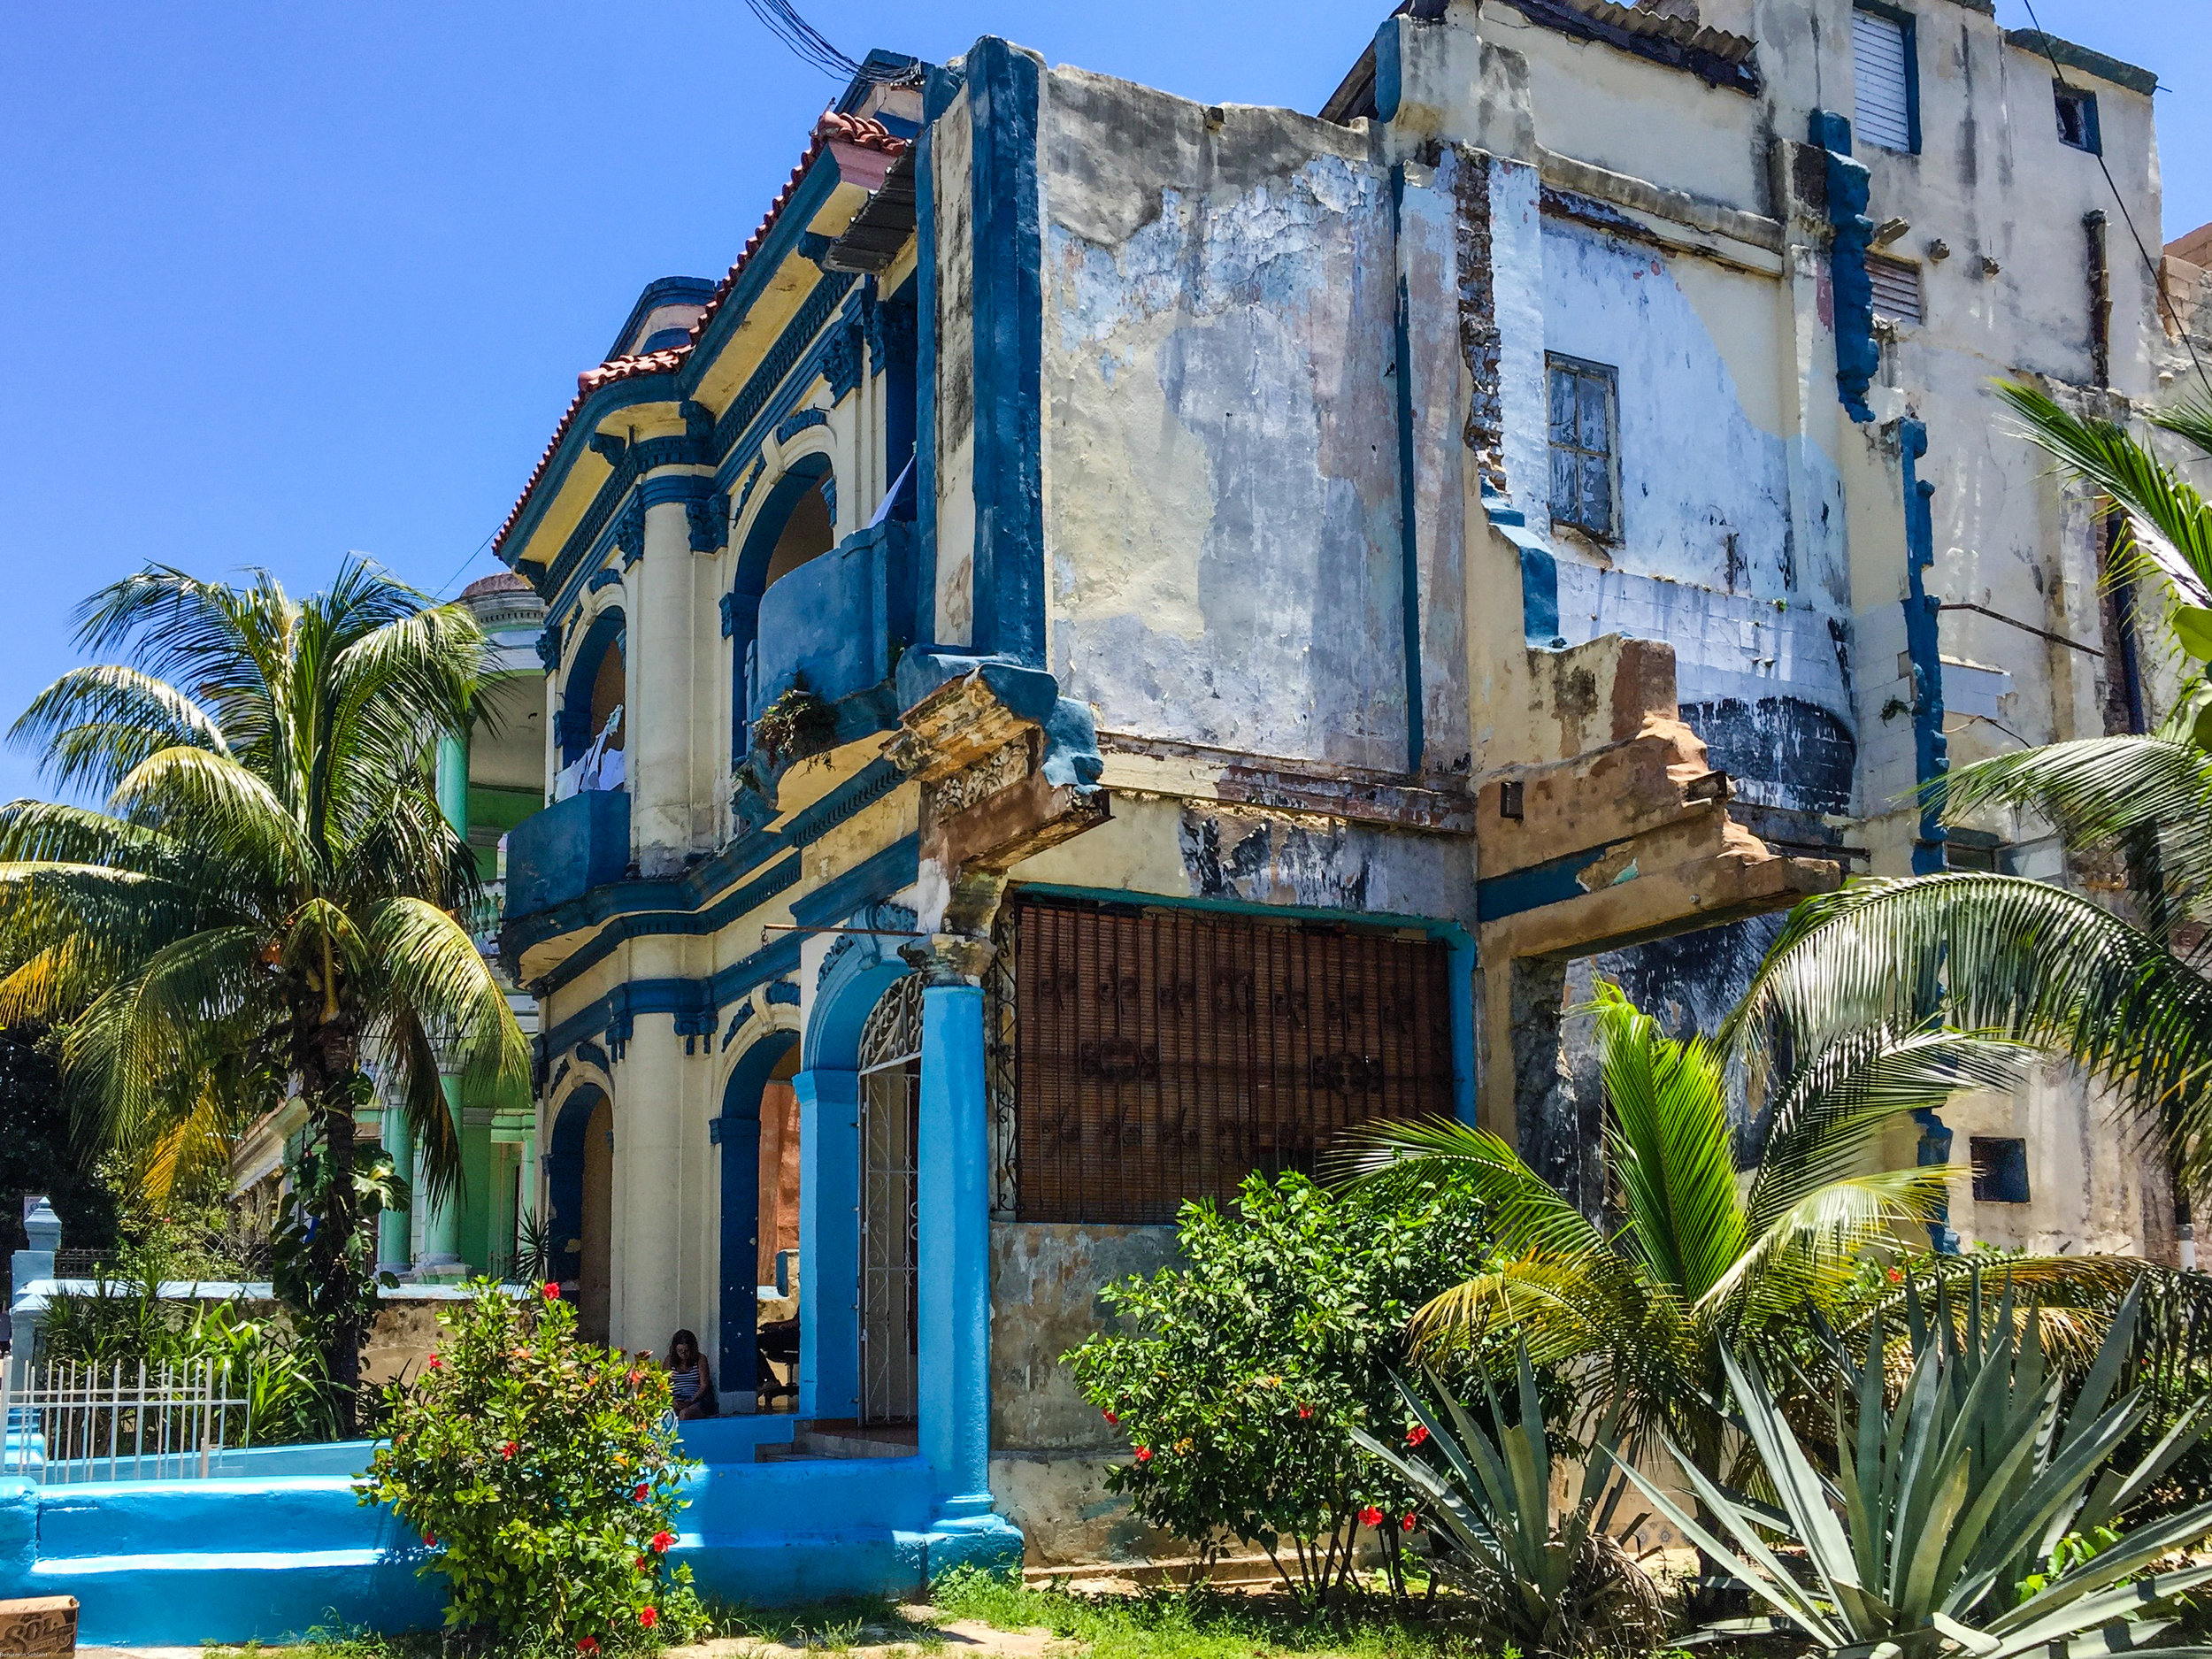 Havana, Cuba - May 2017